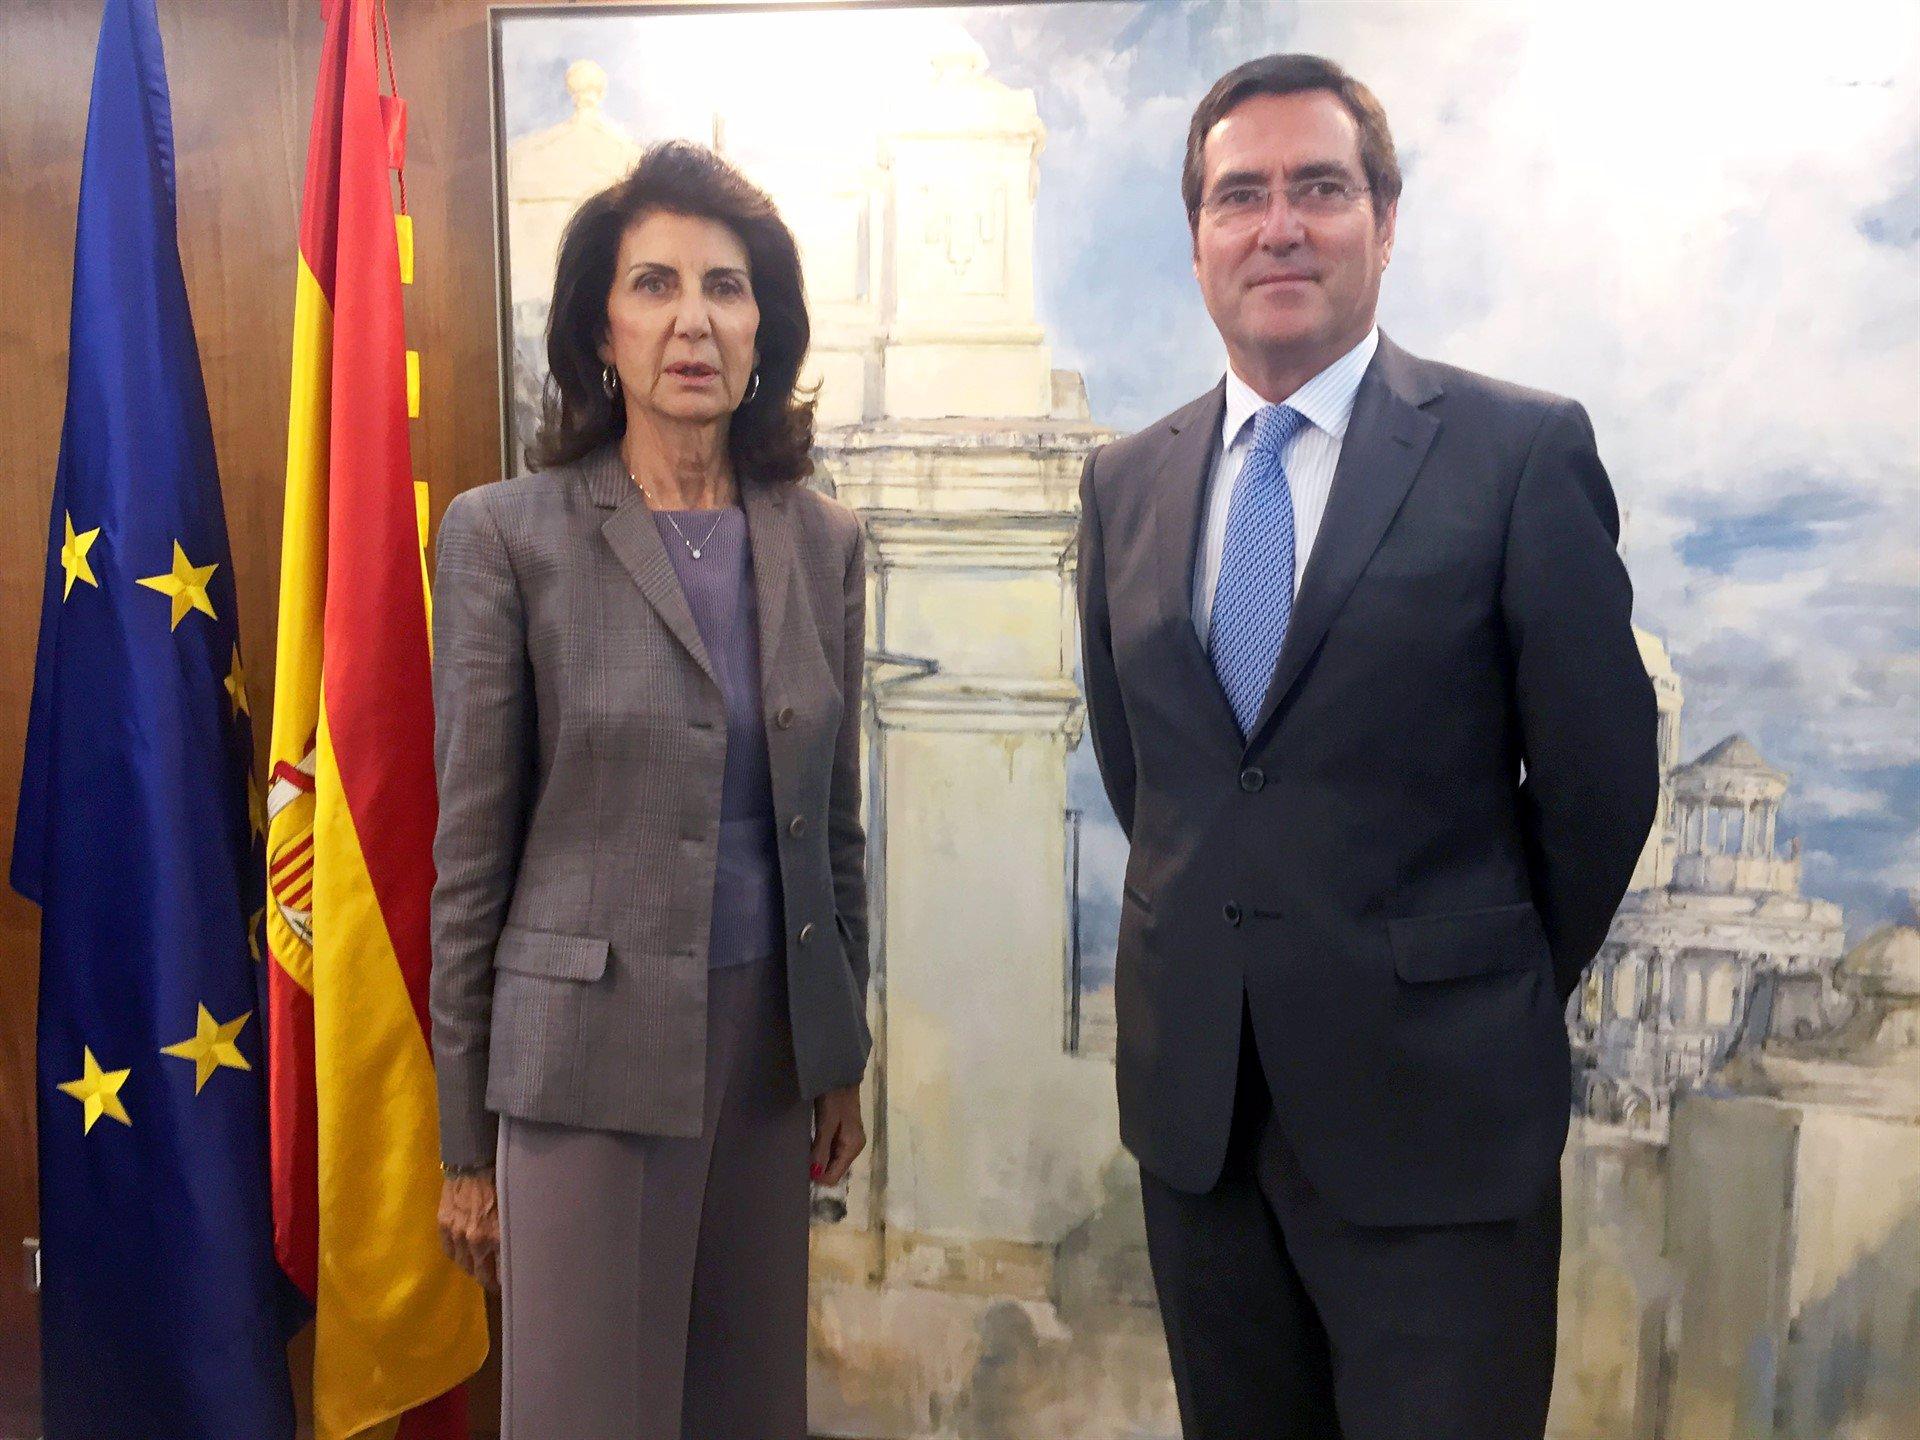 https://img.europapress.es/fotoweb/fotonoticia_20180921201032_1920.jpg